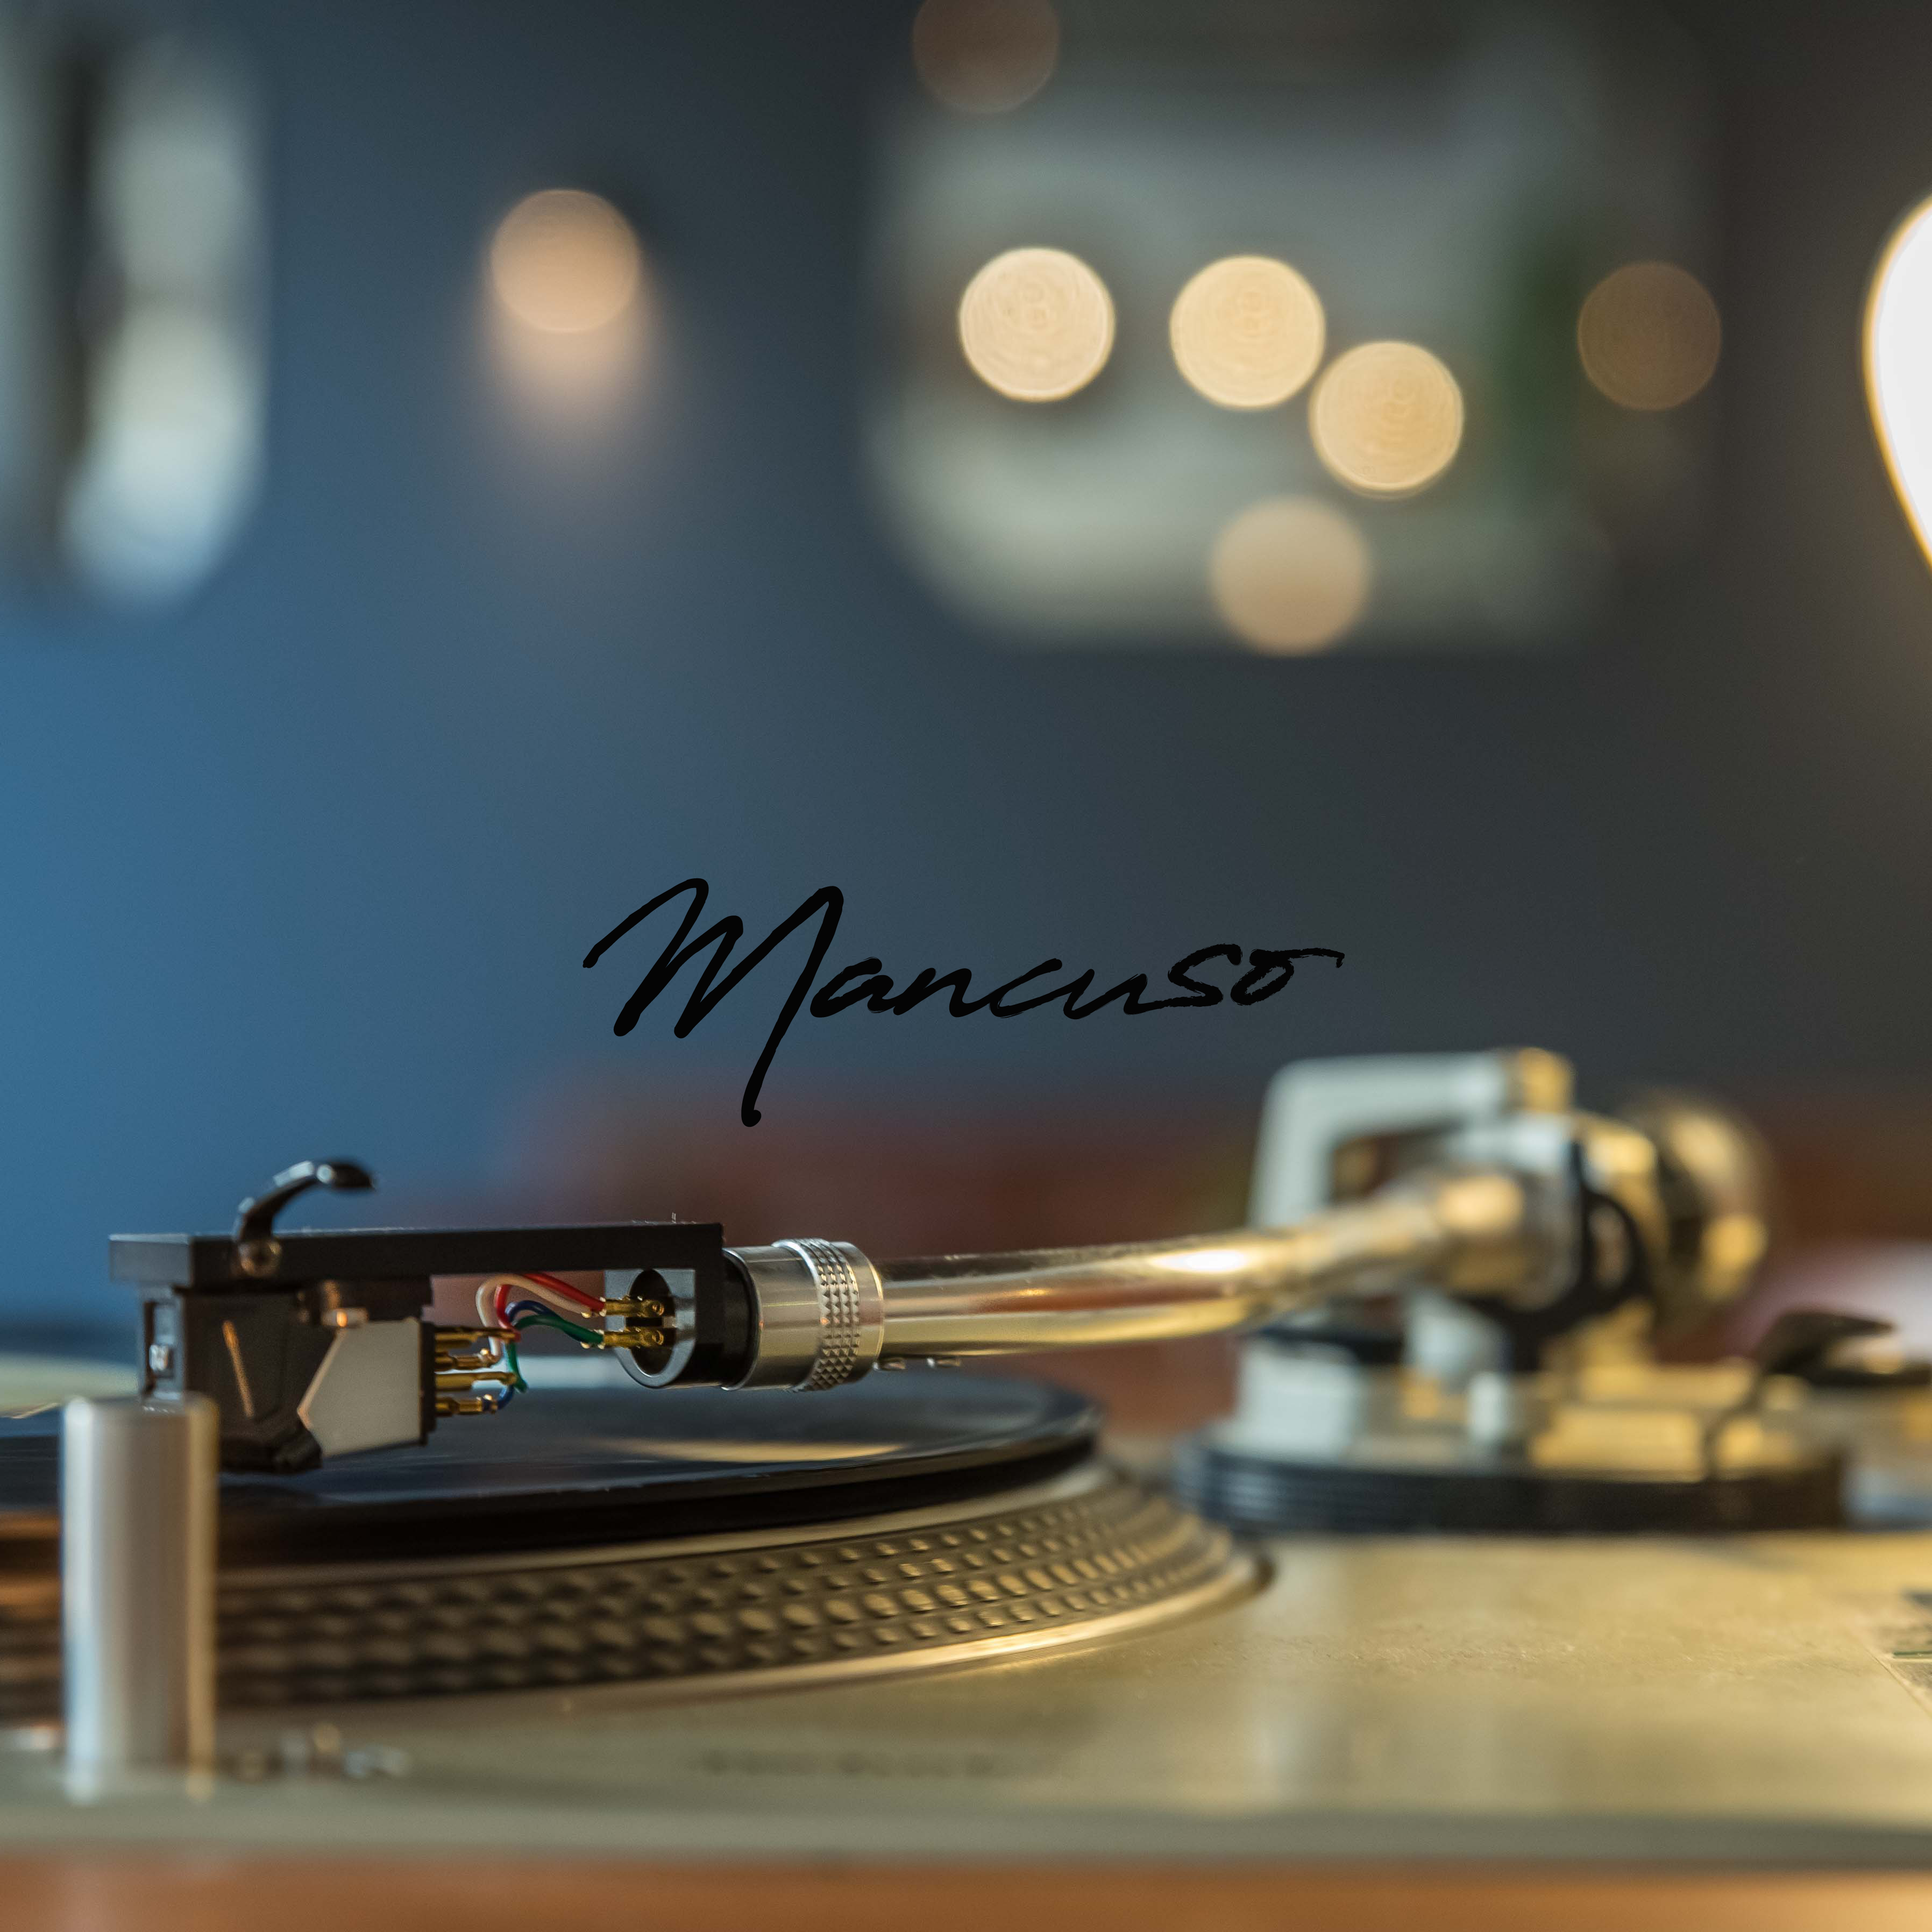 Cafe Mancuso